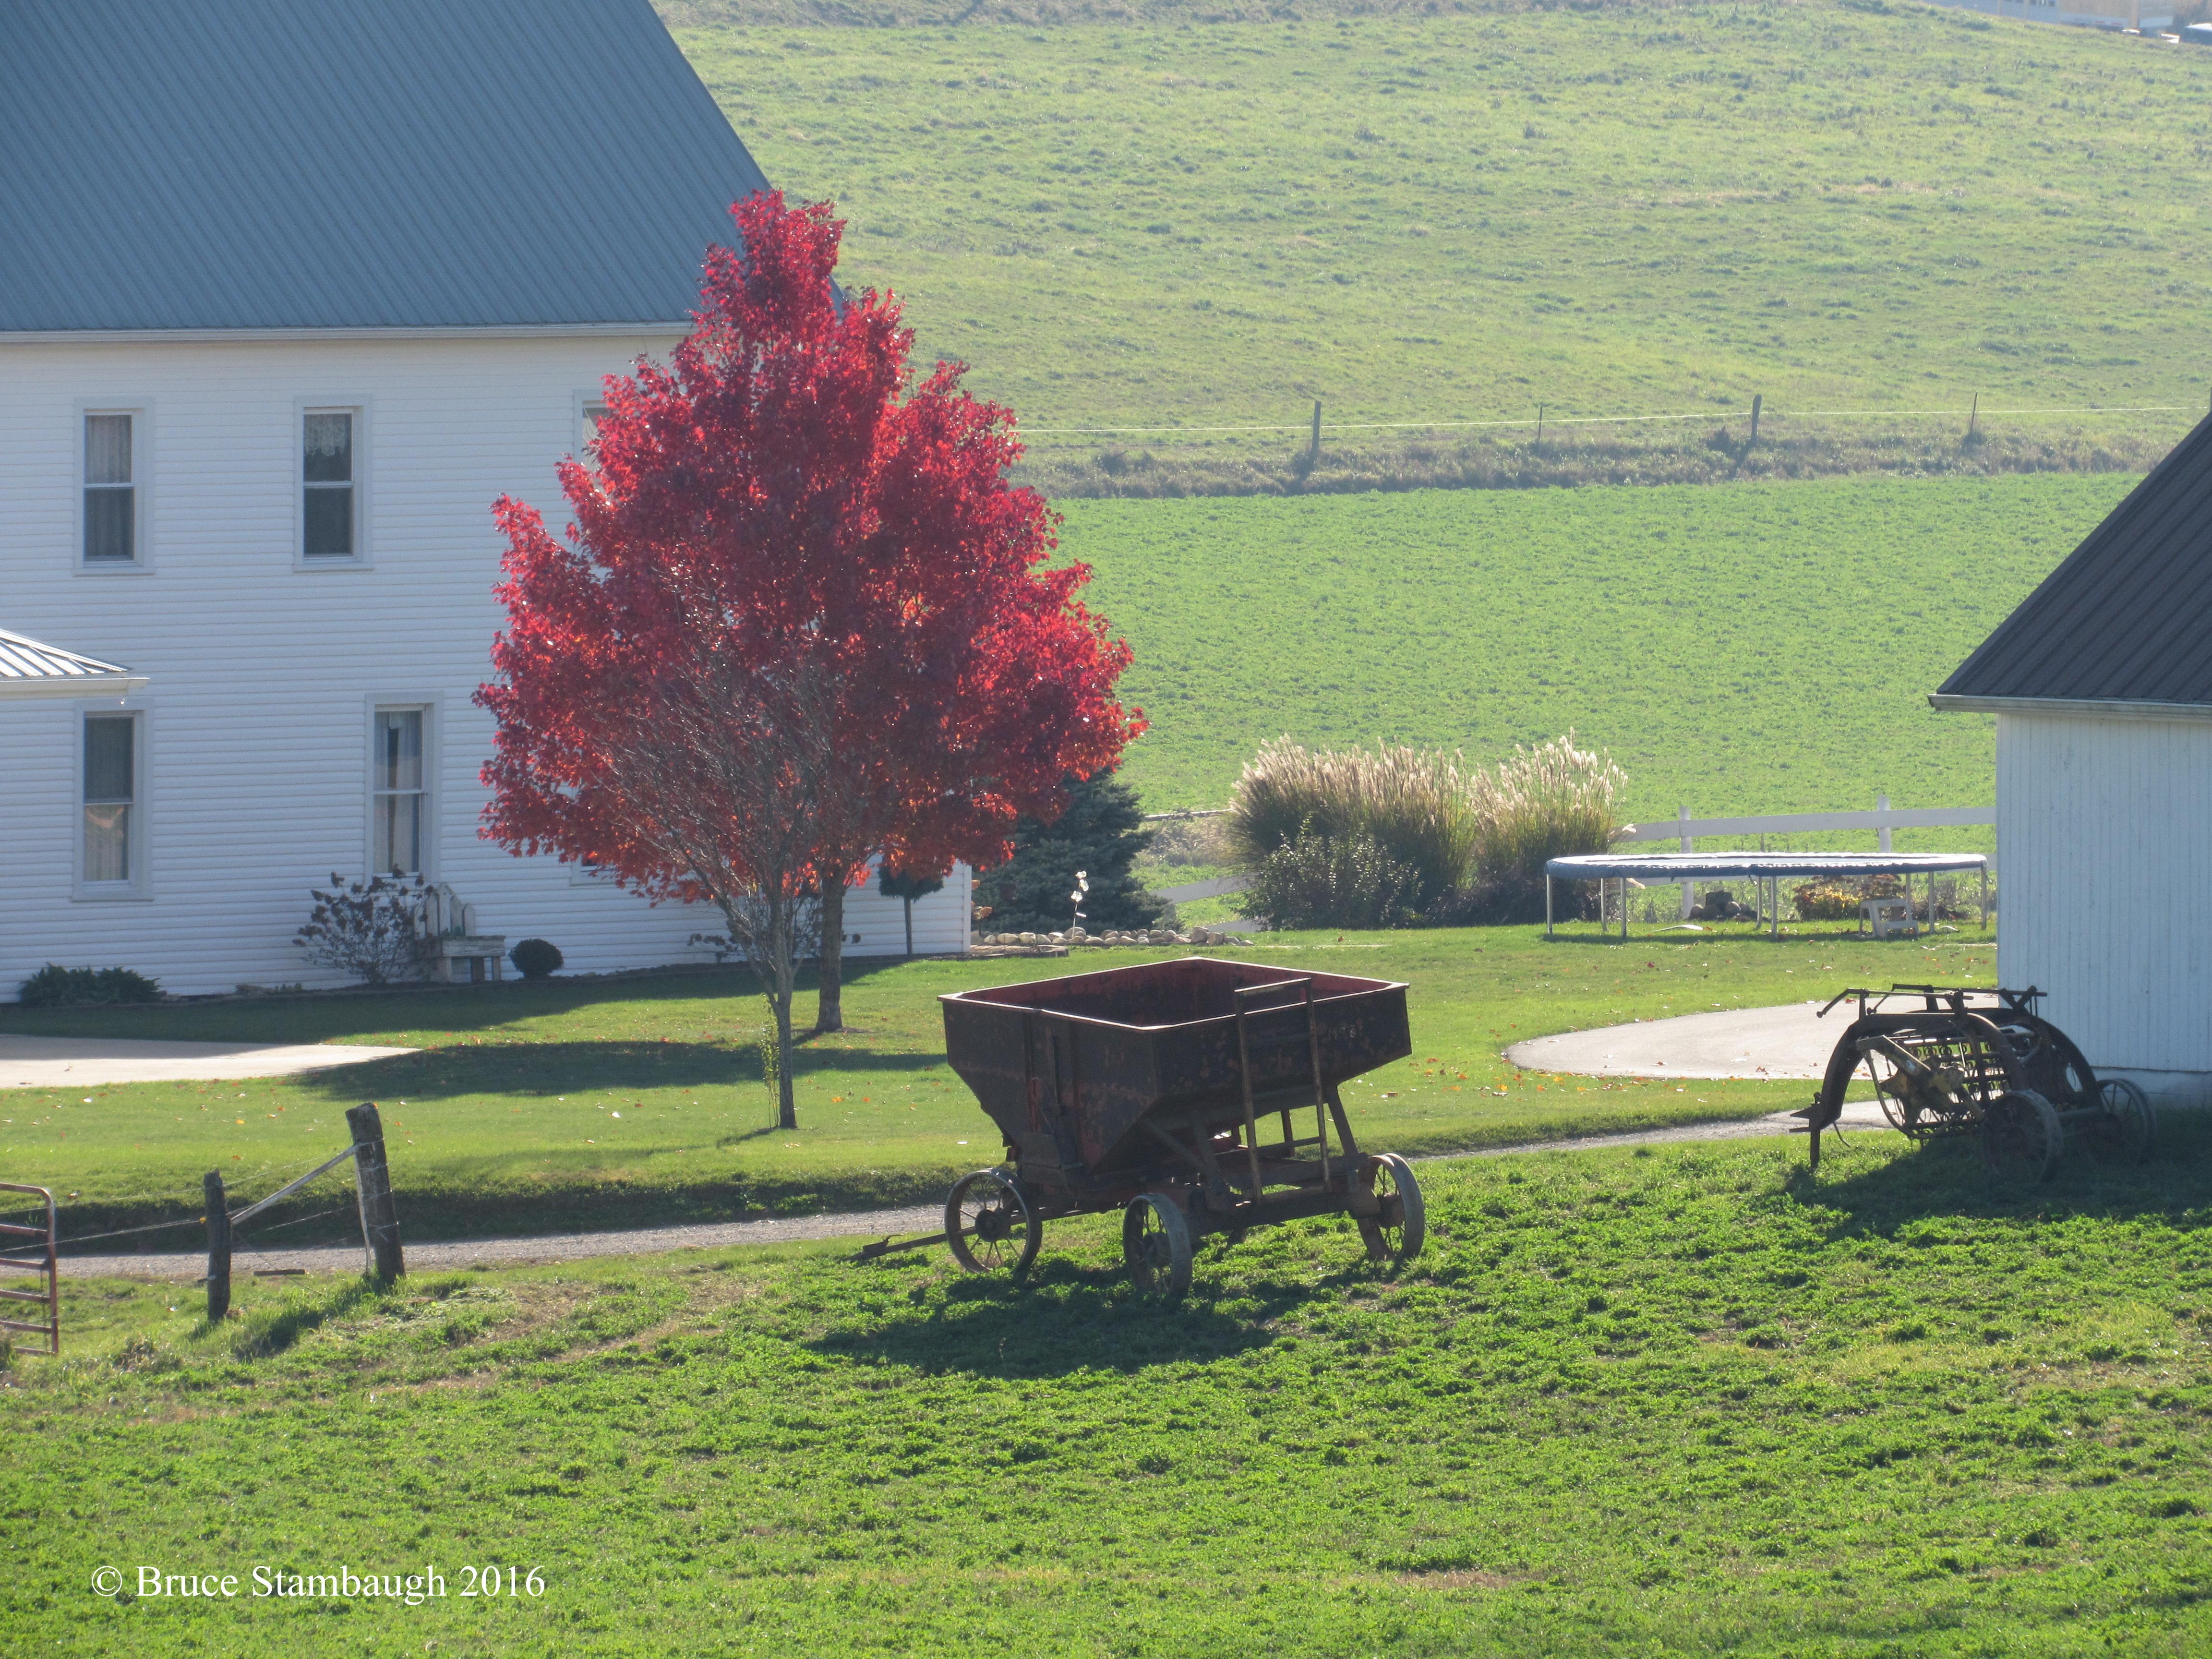 Amish farmstead, farm implements